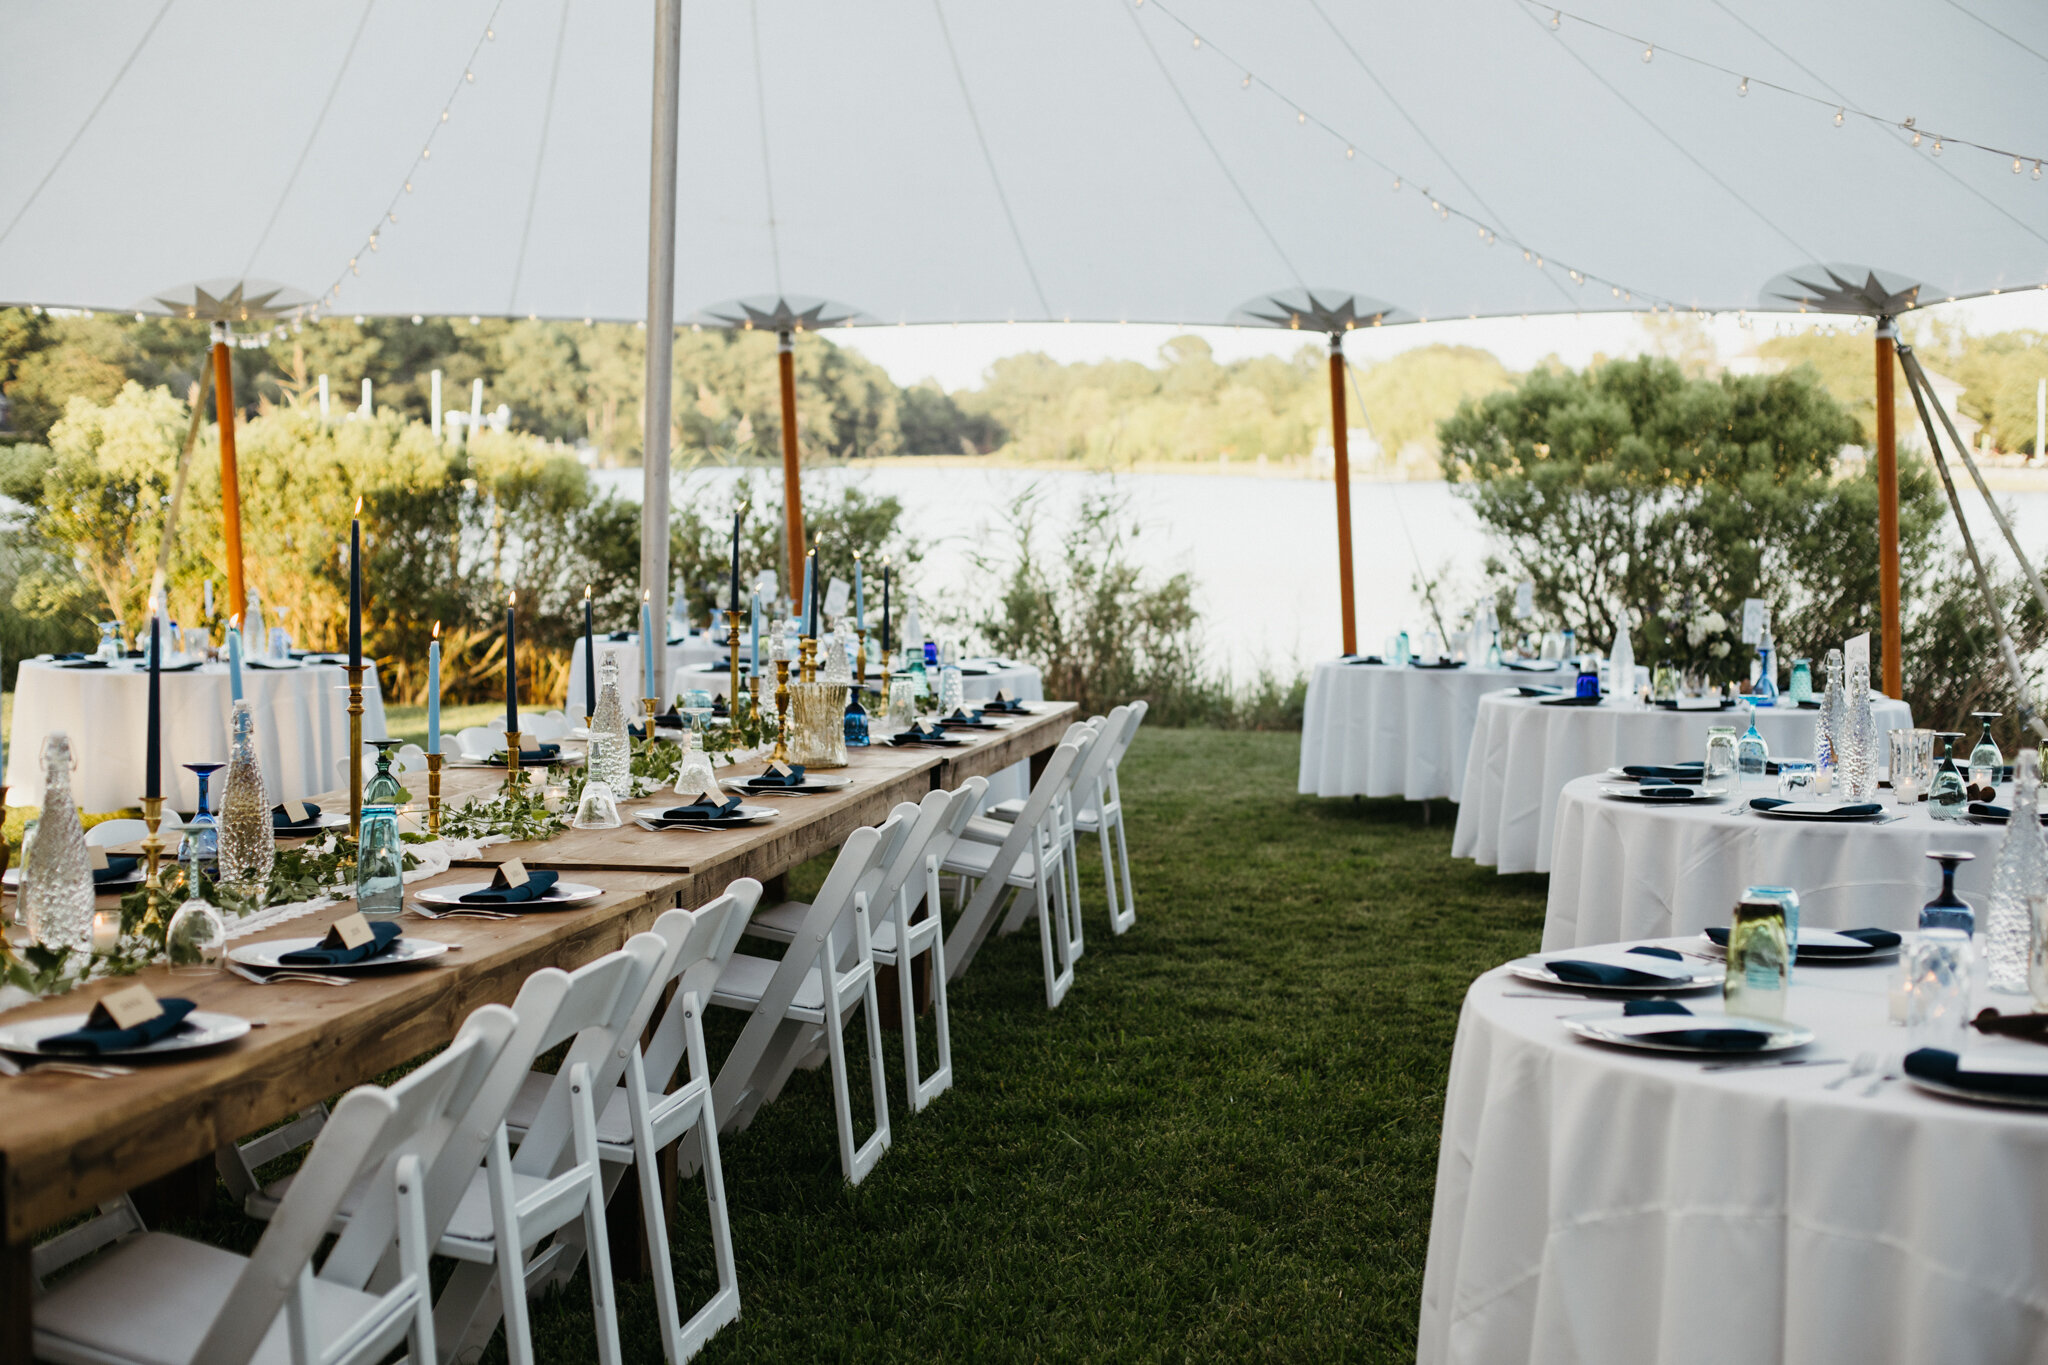 angela_jason_norfolk_wedding-119.jpg